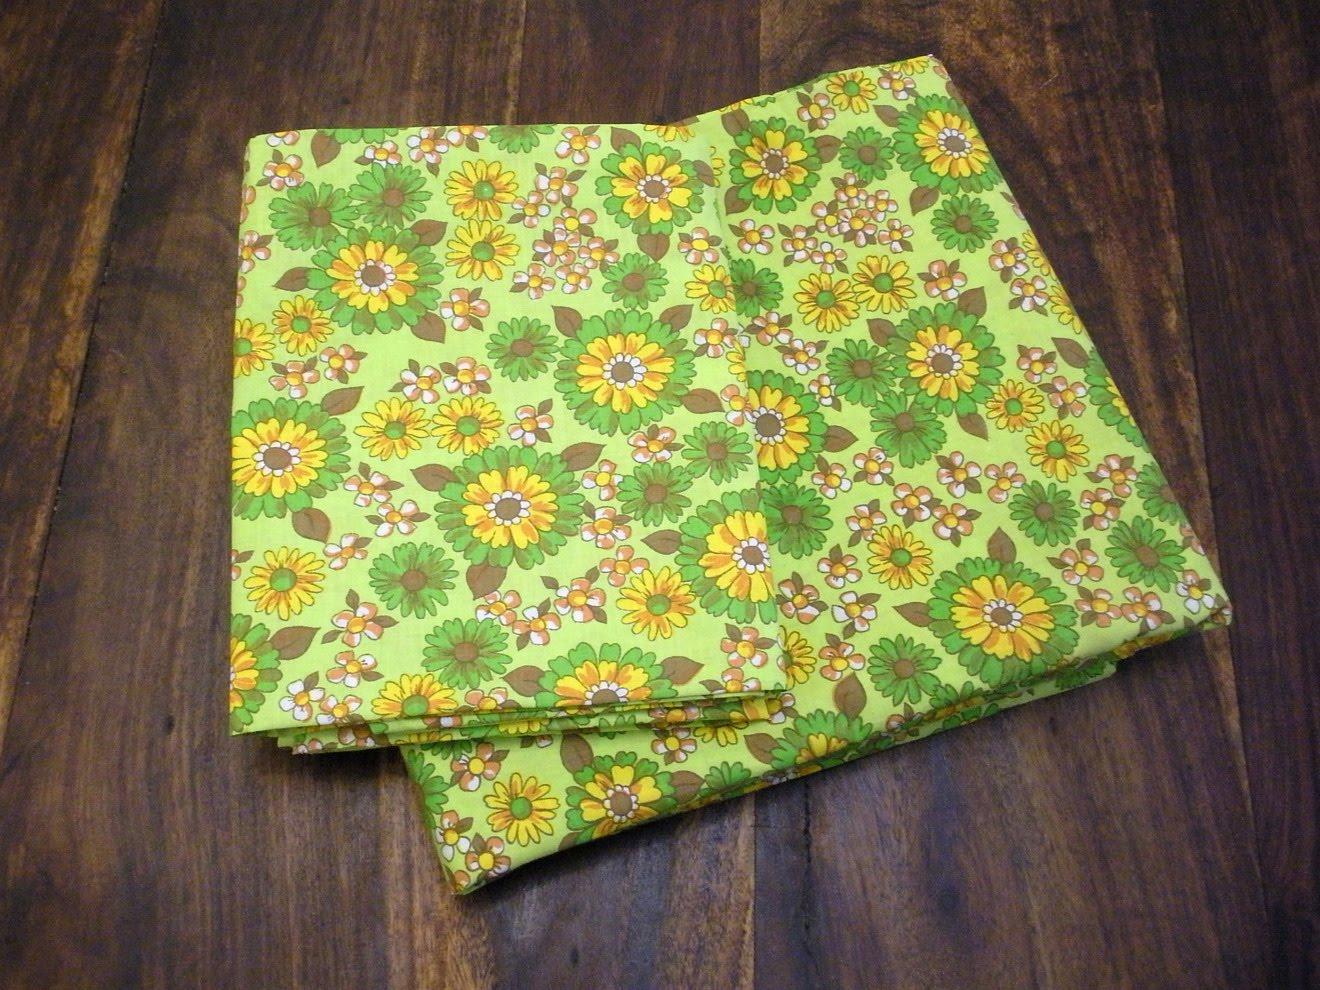 Vintage Dri Glo sheet set in